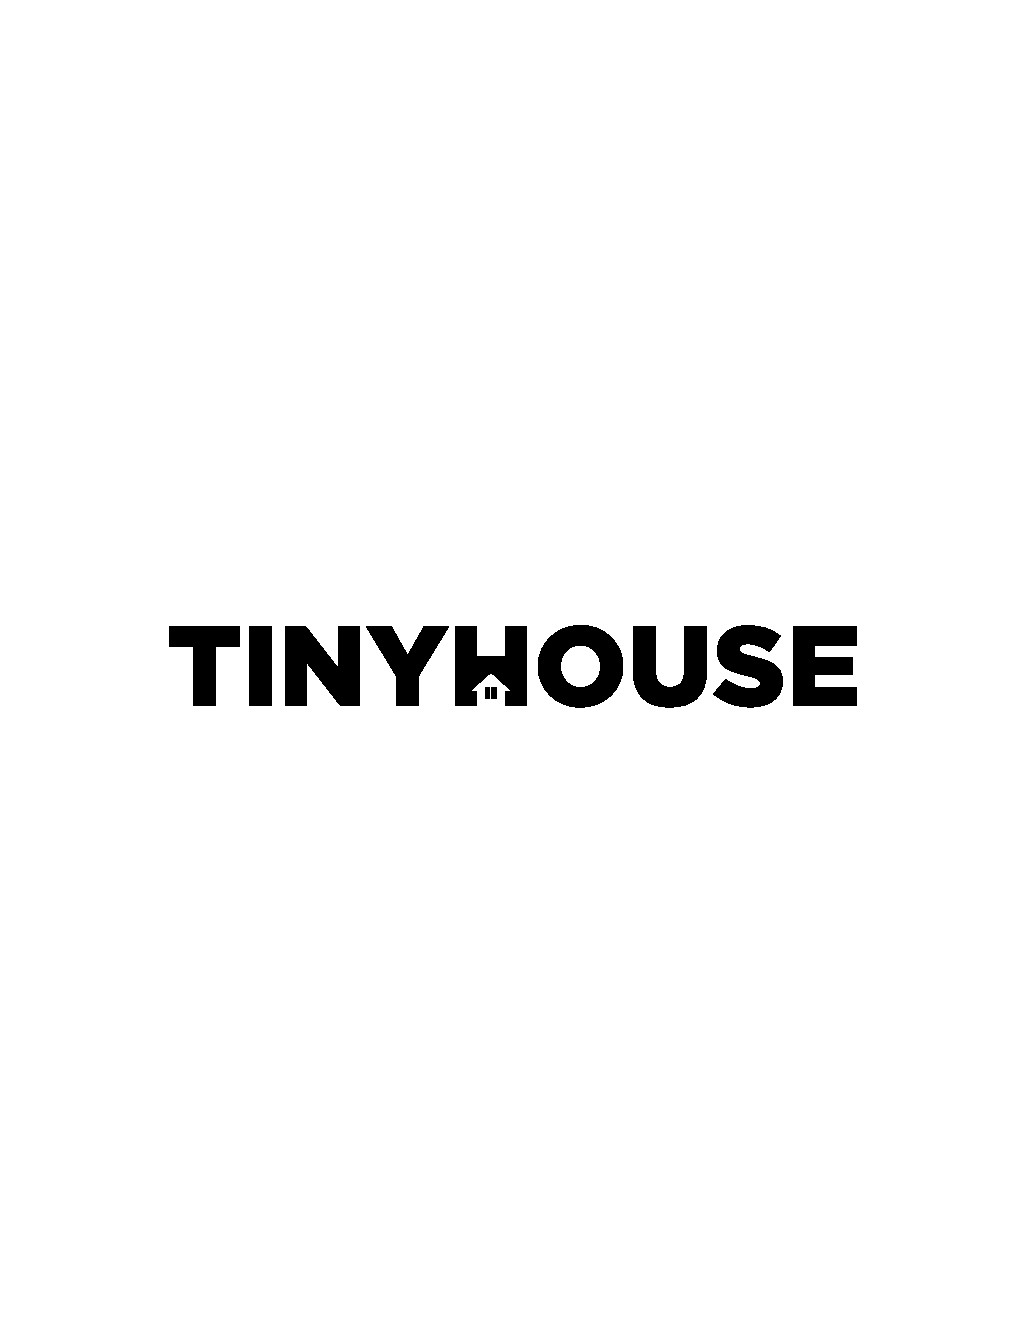 Tinyhouse brand logo